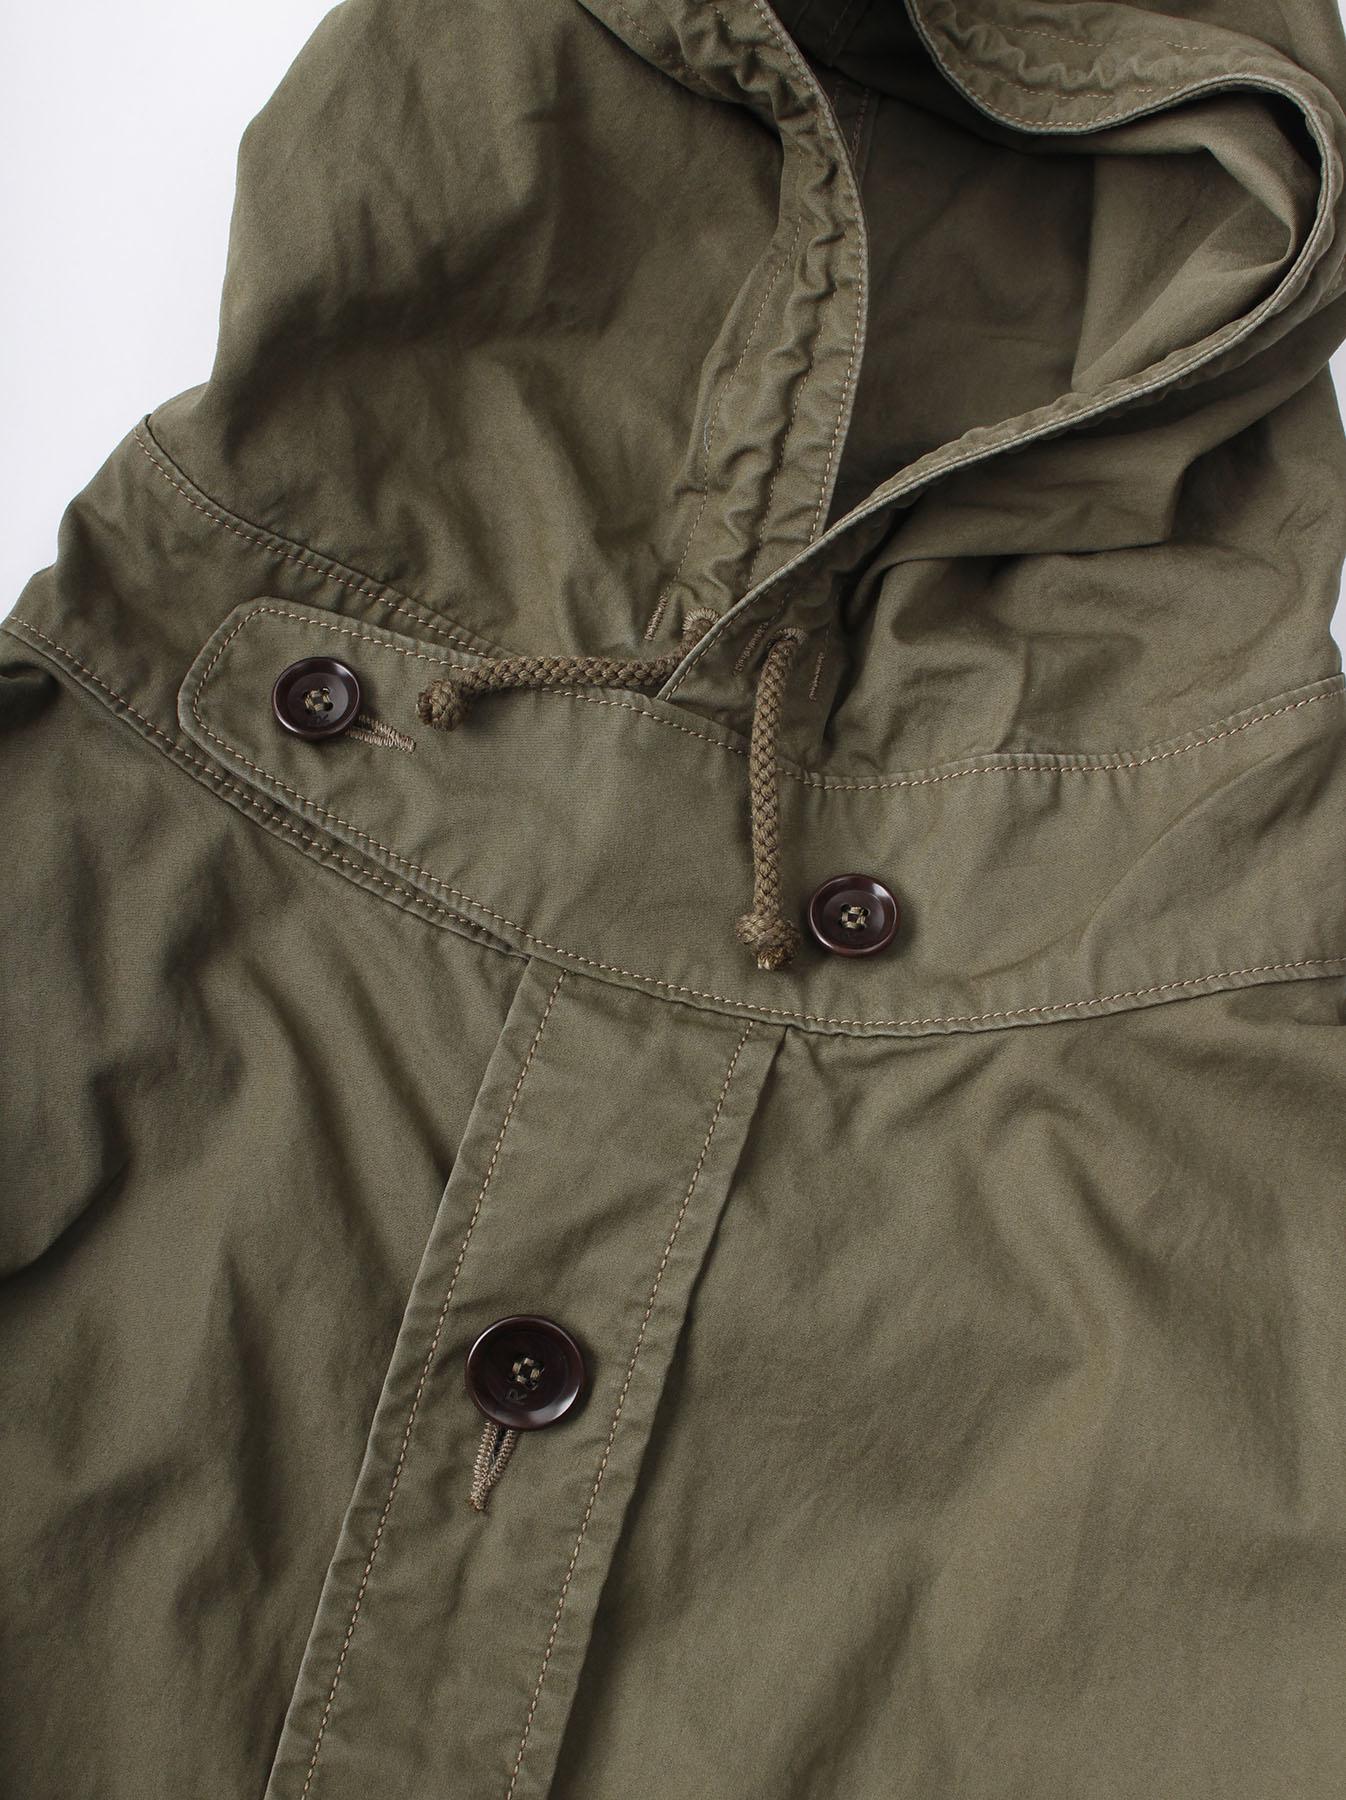 Weather Cloth Umahiko Mods Hoodie-8